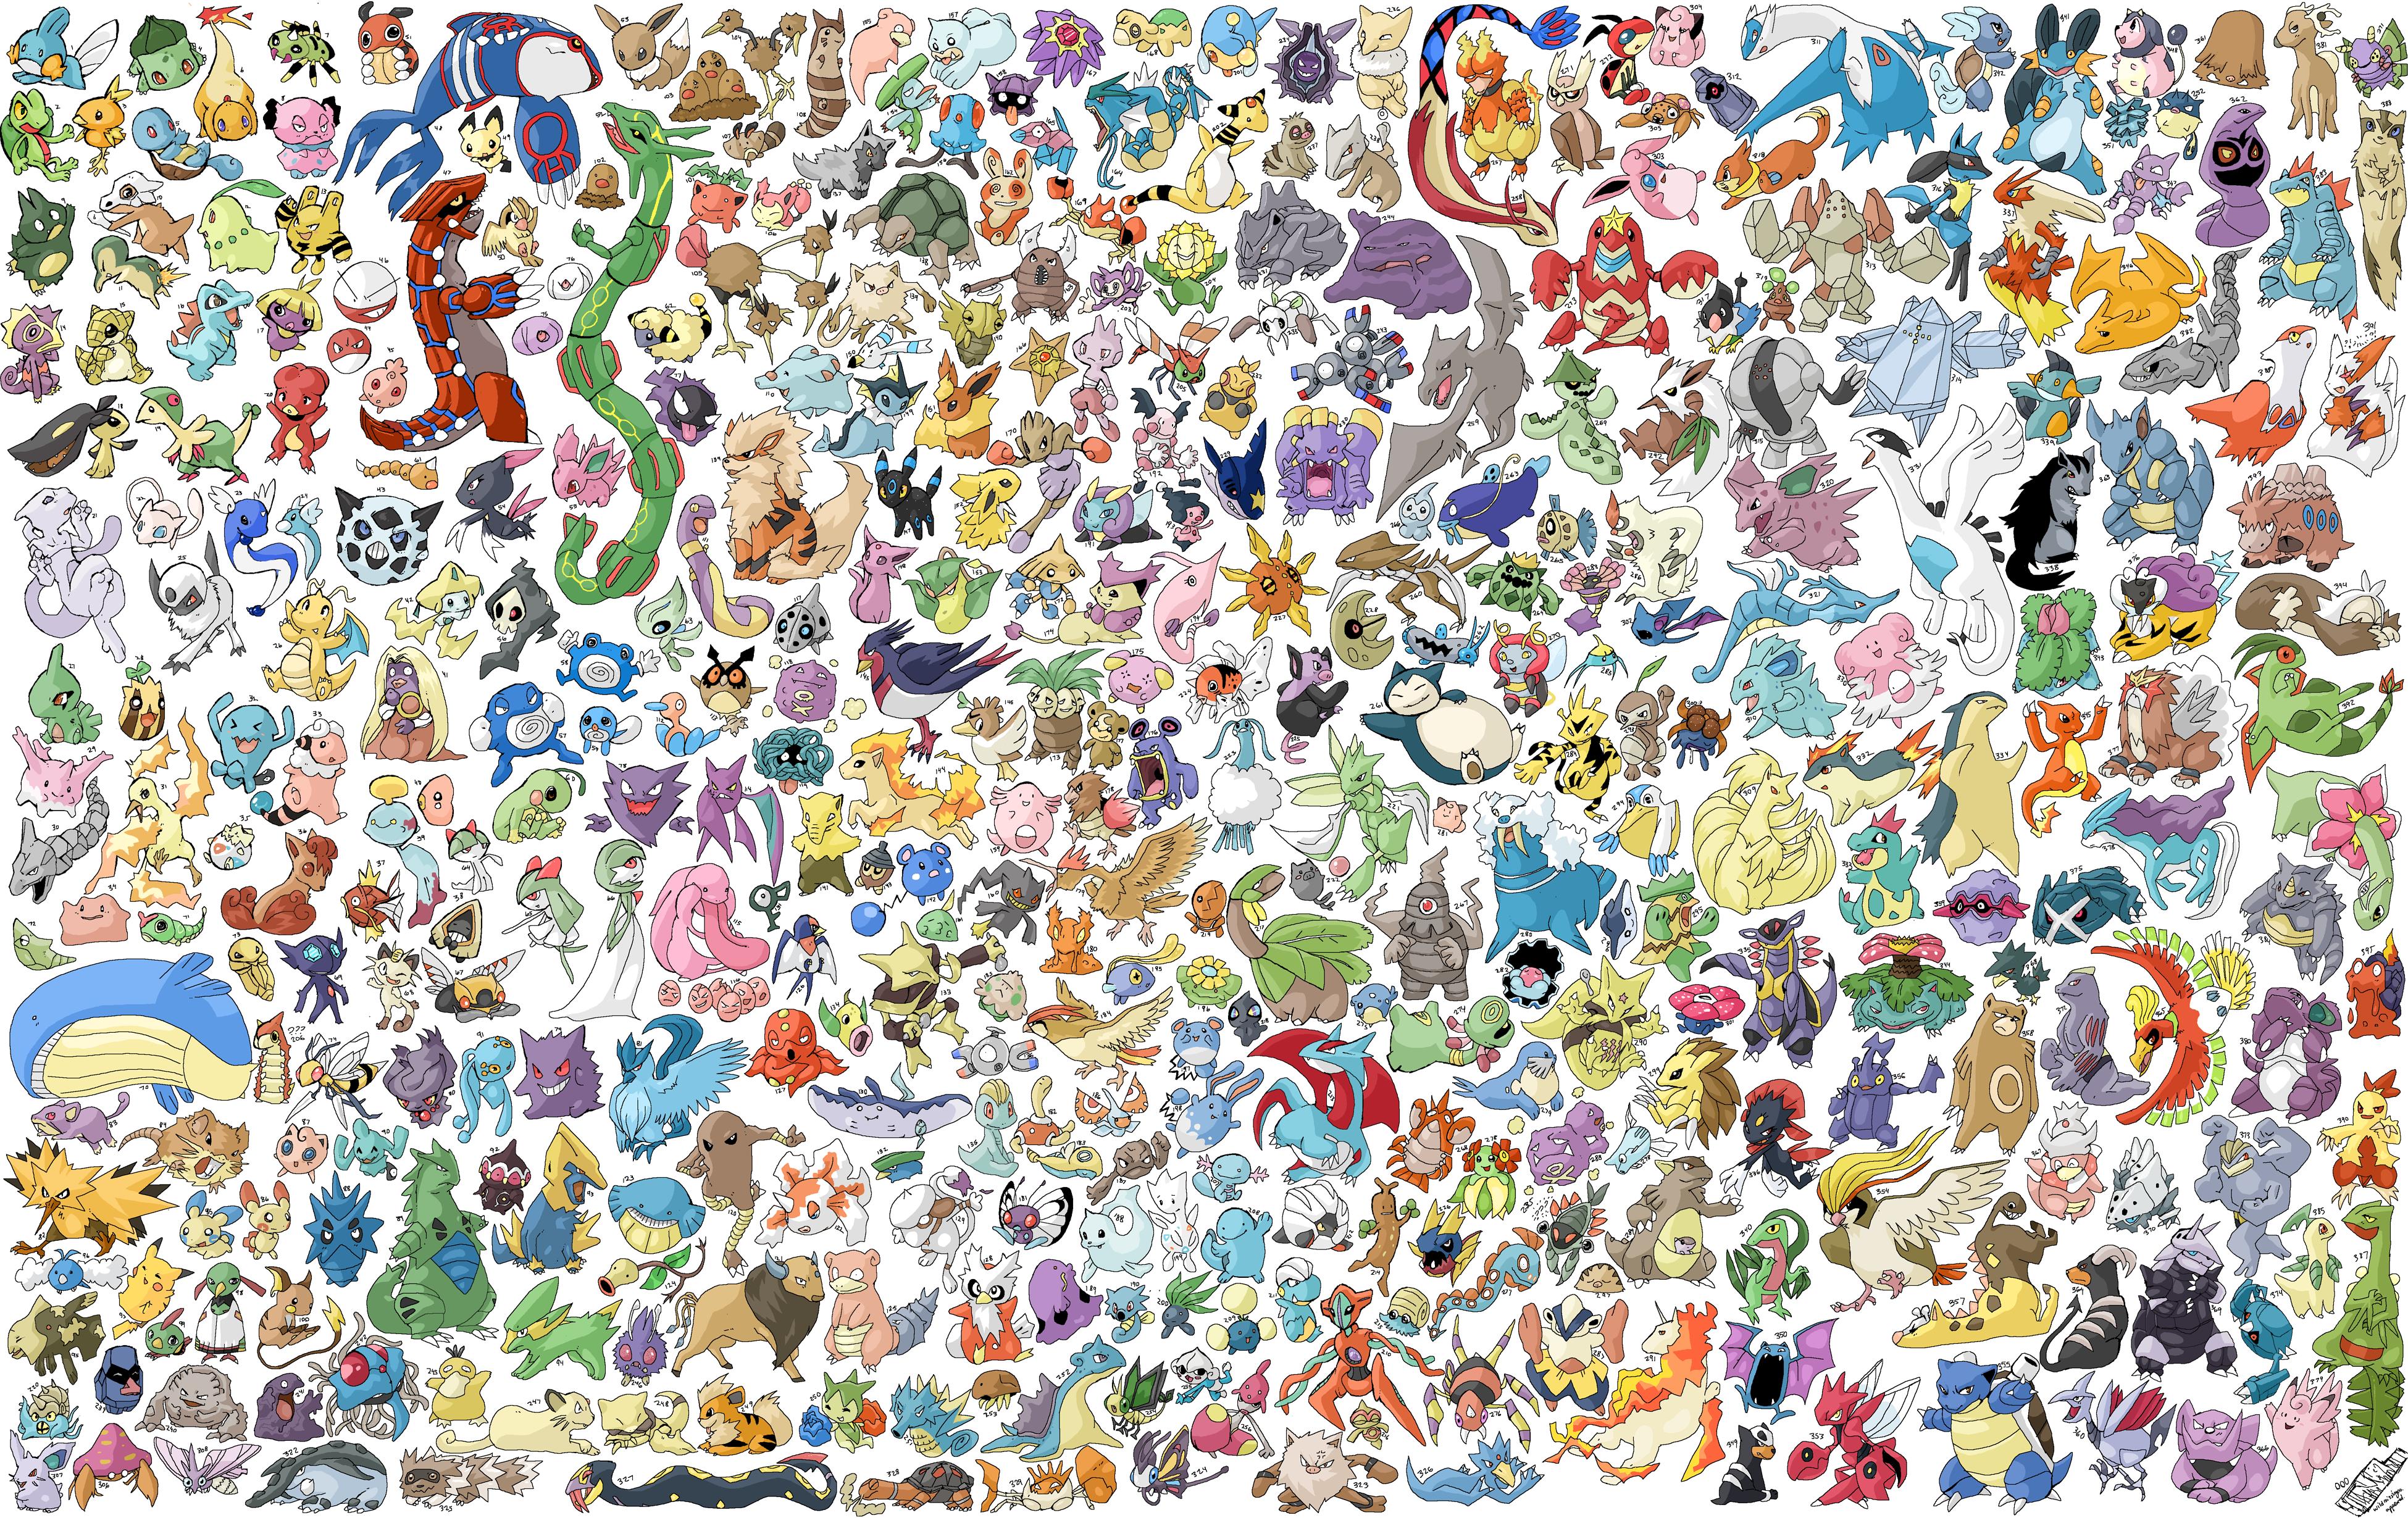 All Pokemon Wallpaper wallpaper wallpaper hd background desktop 3900x2459